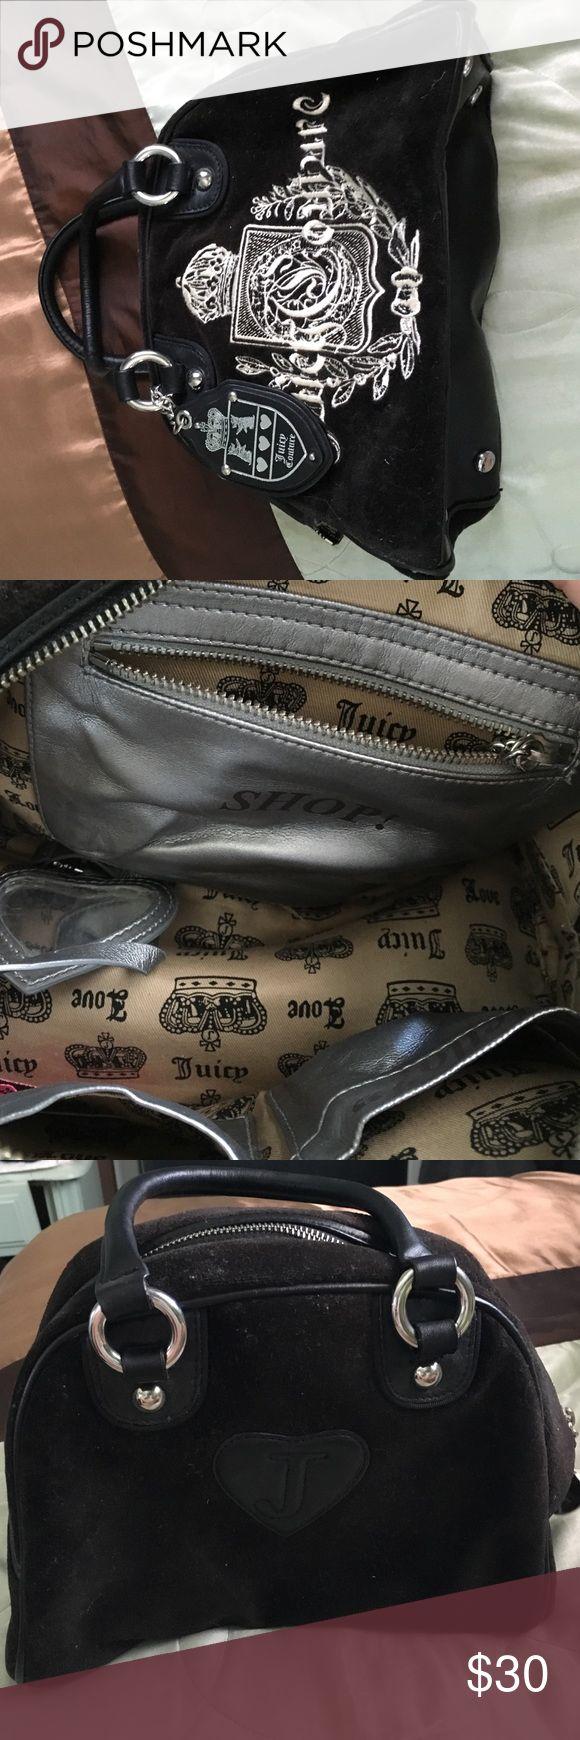 Juicy couture bowler bag Black juicy couture bowler bag Juicy Couture Bags Totes